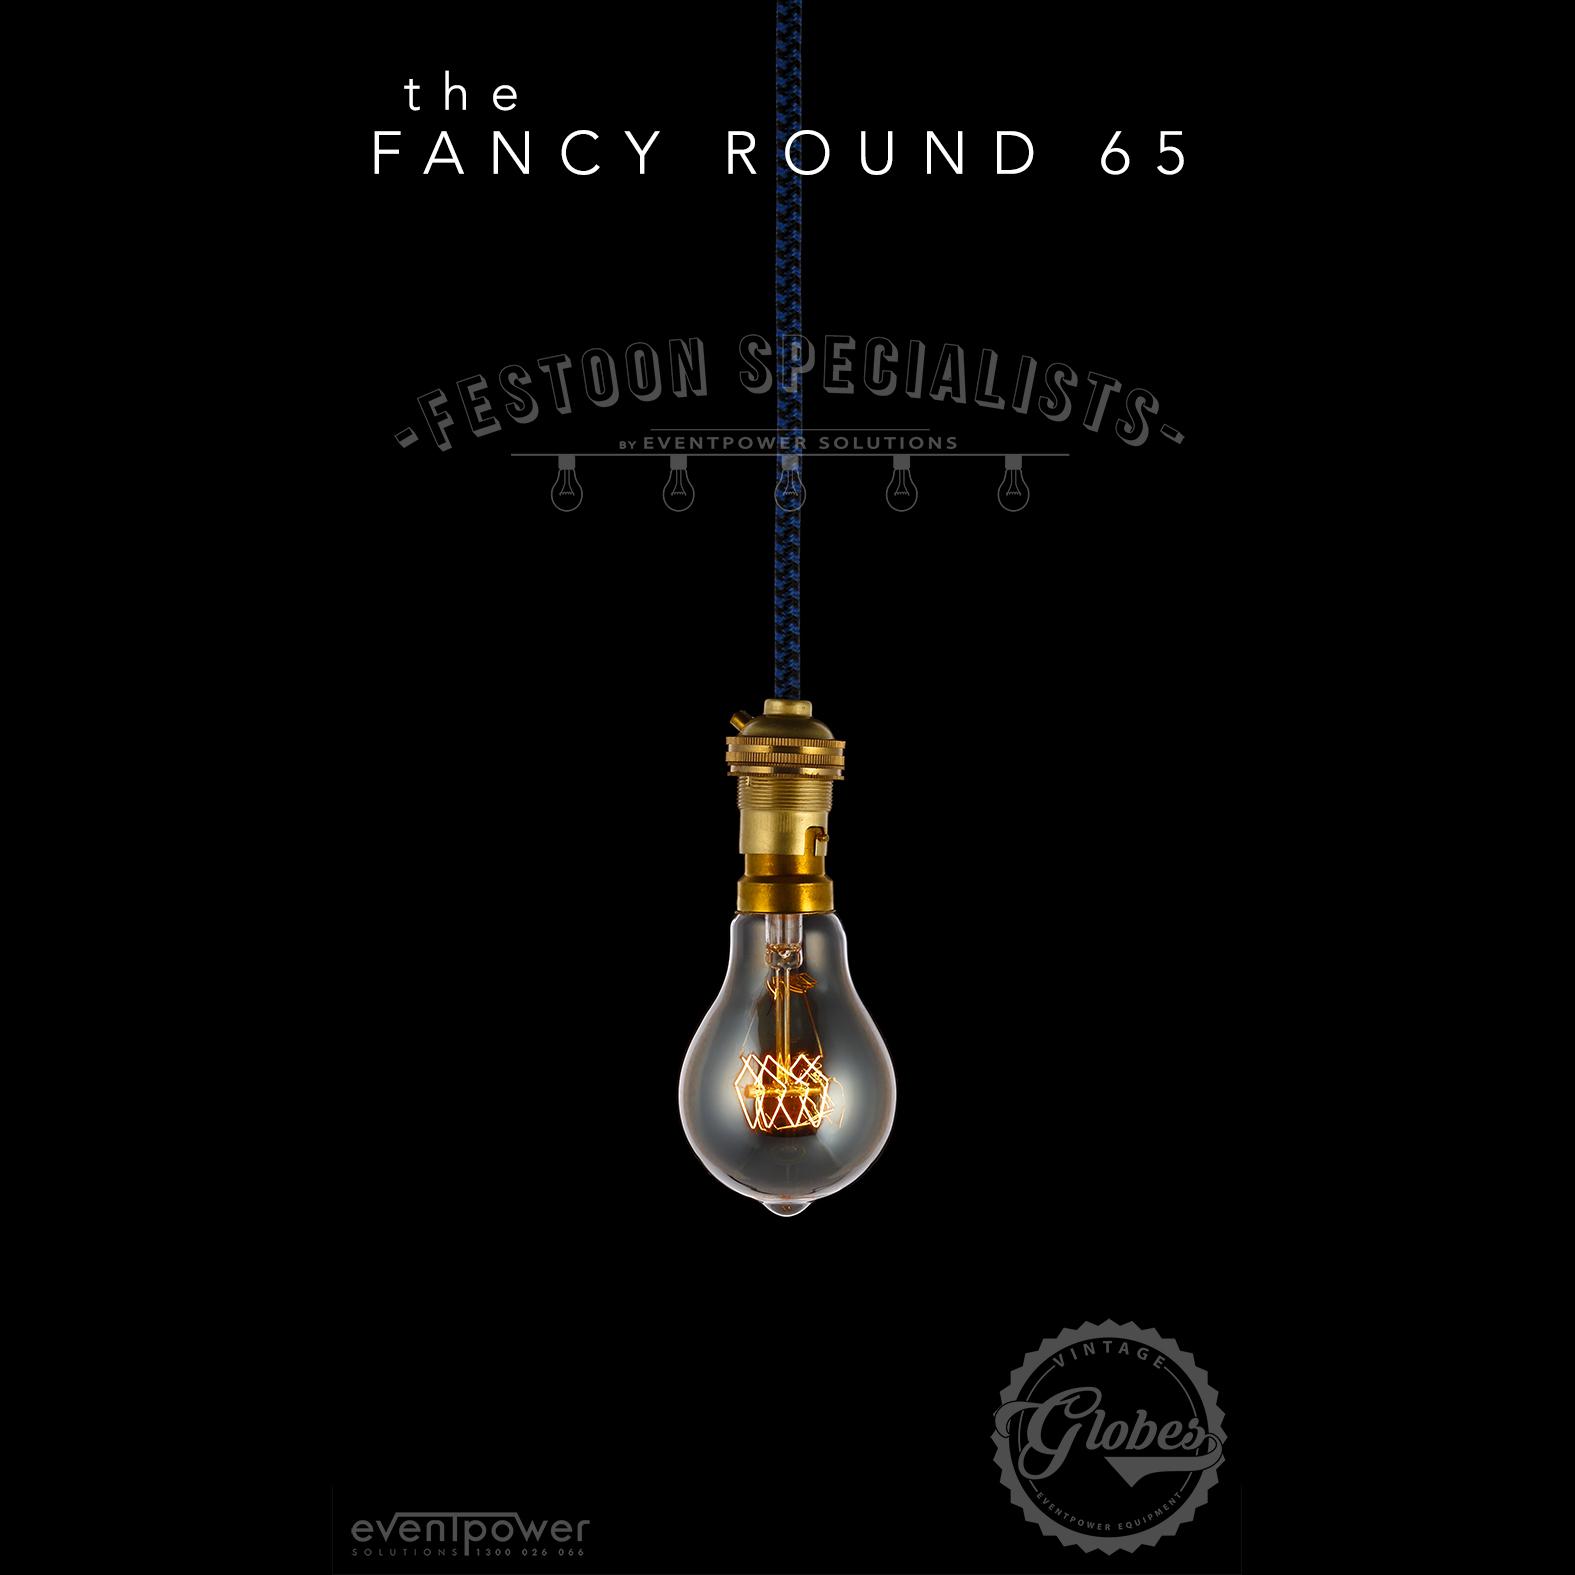 Festoon_Specialists-Fancy_Round_60mm.jpg